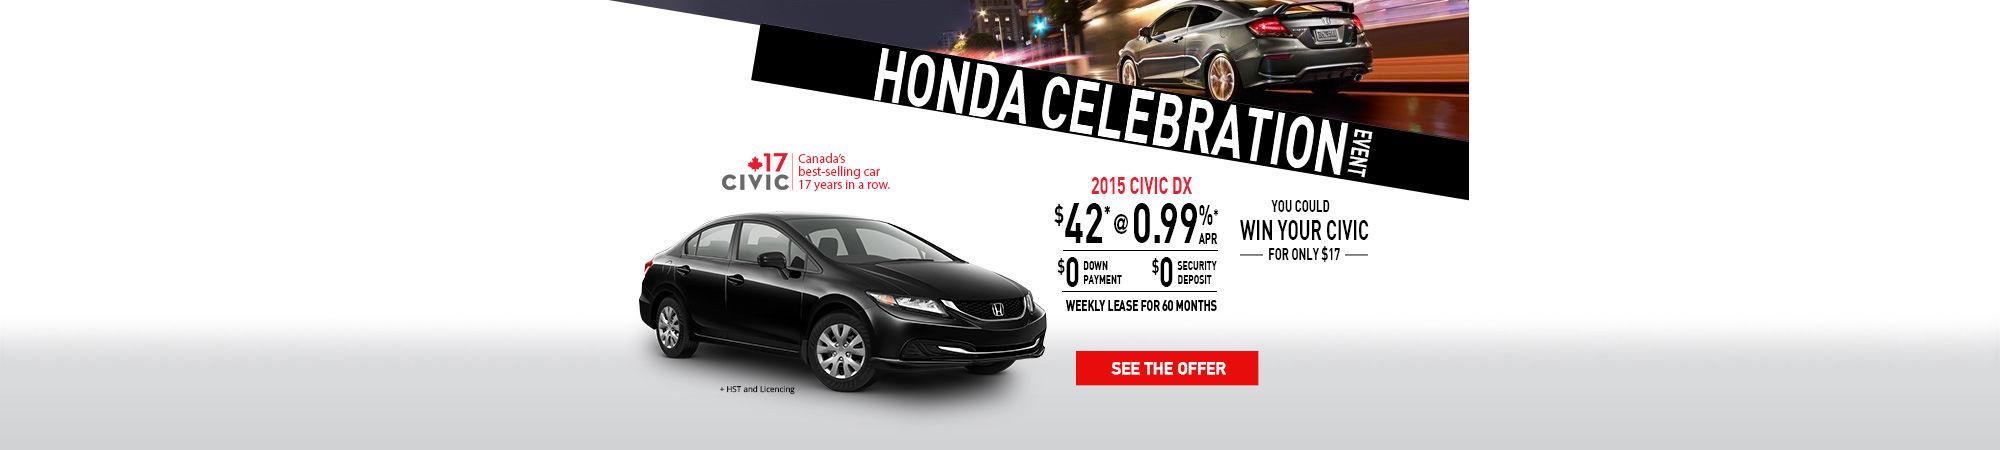 Honda Celebration - 2015 Honda CIVIC - February